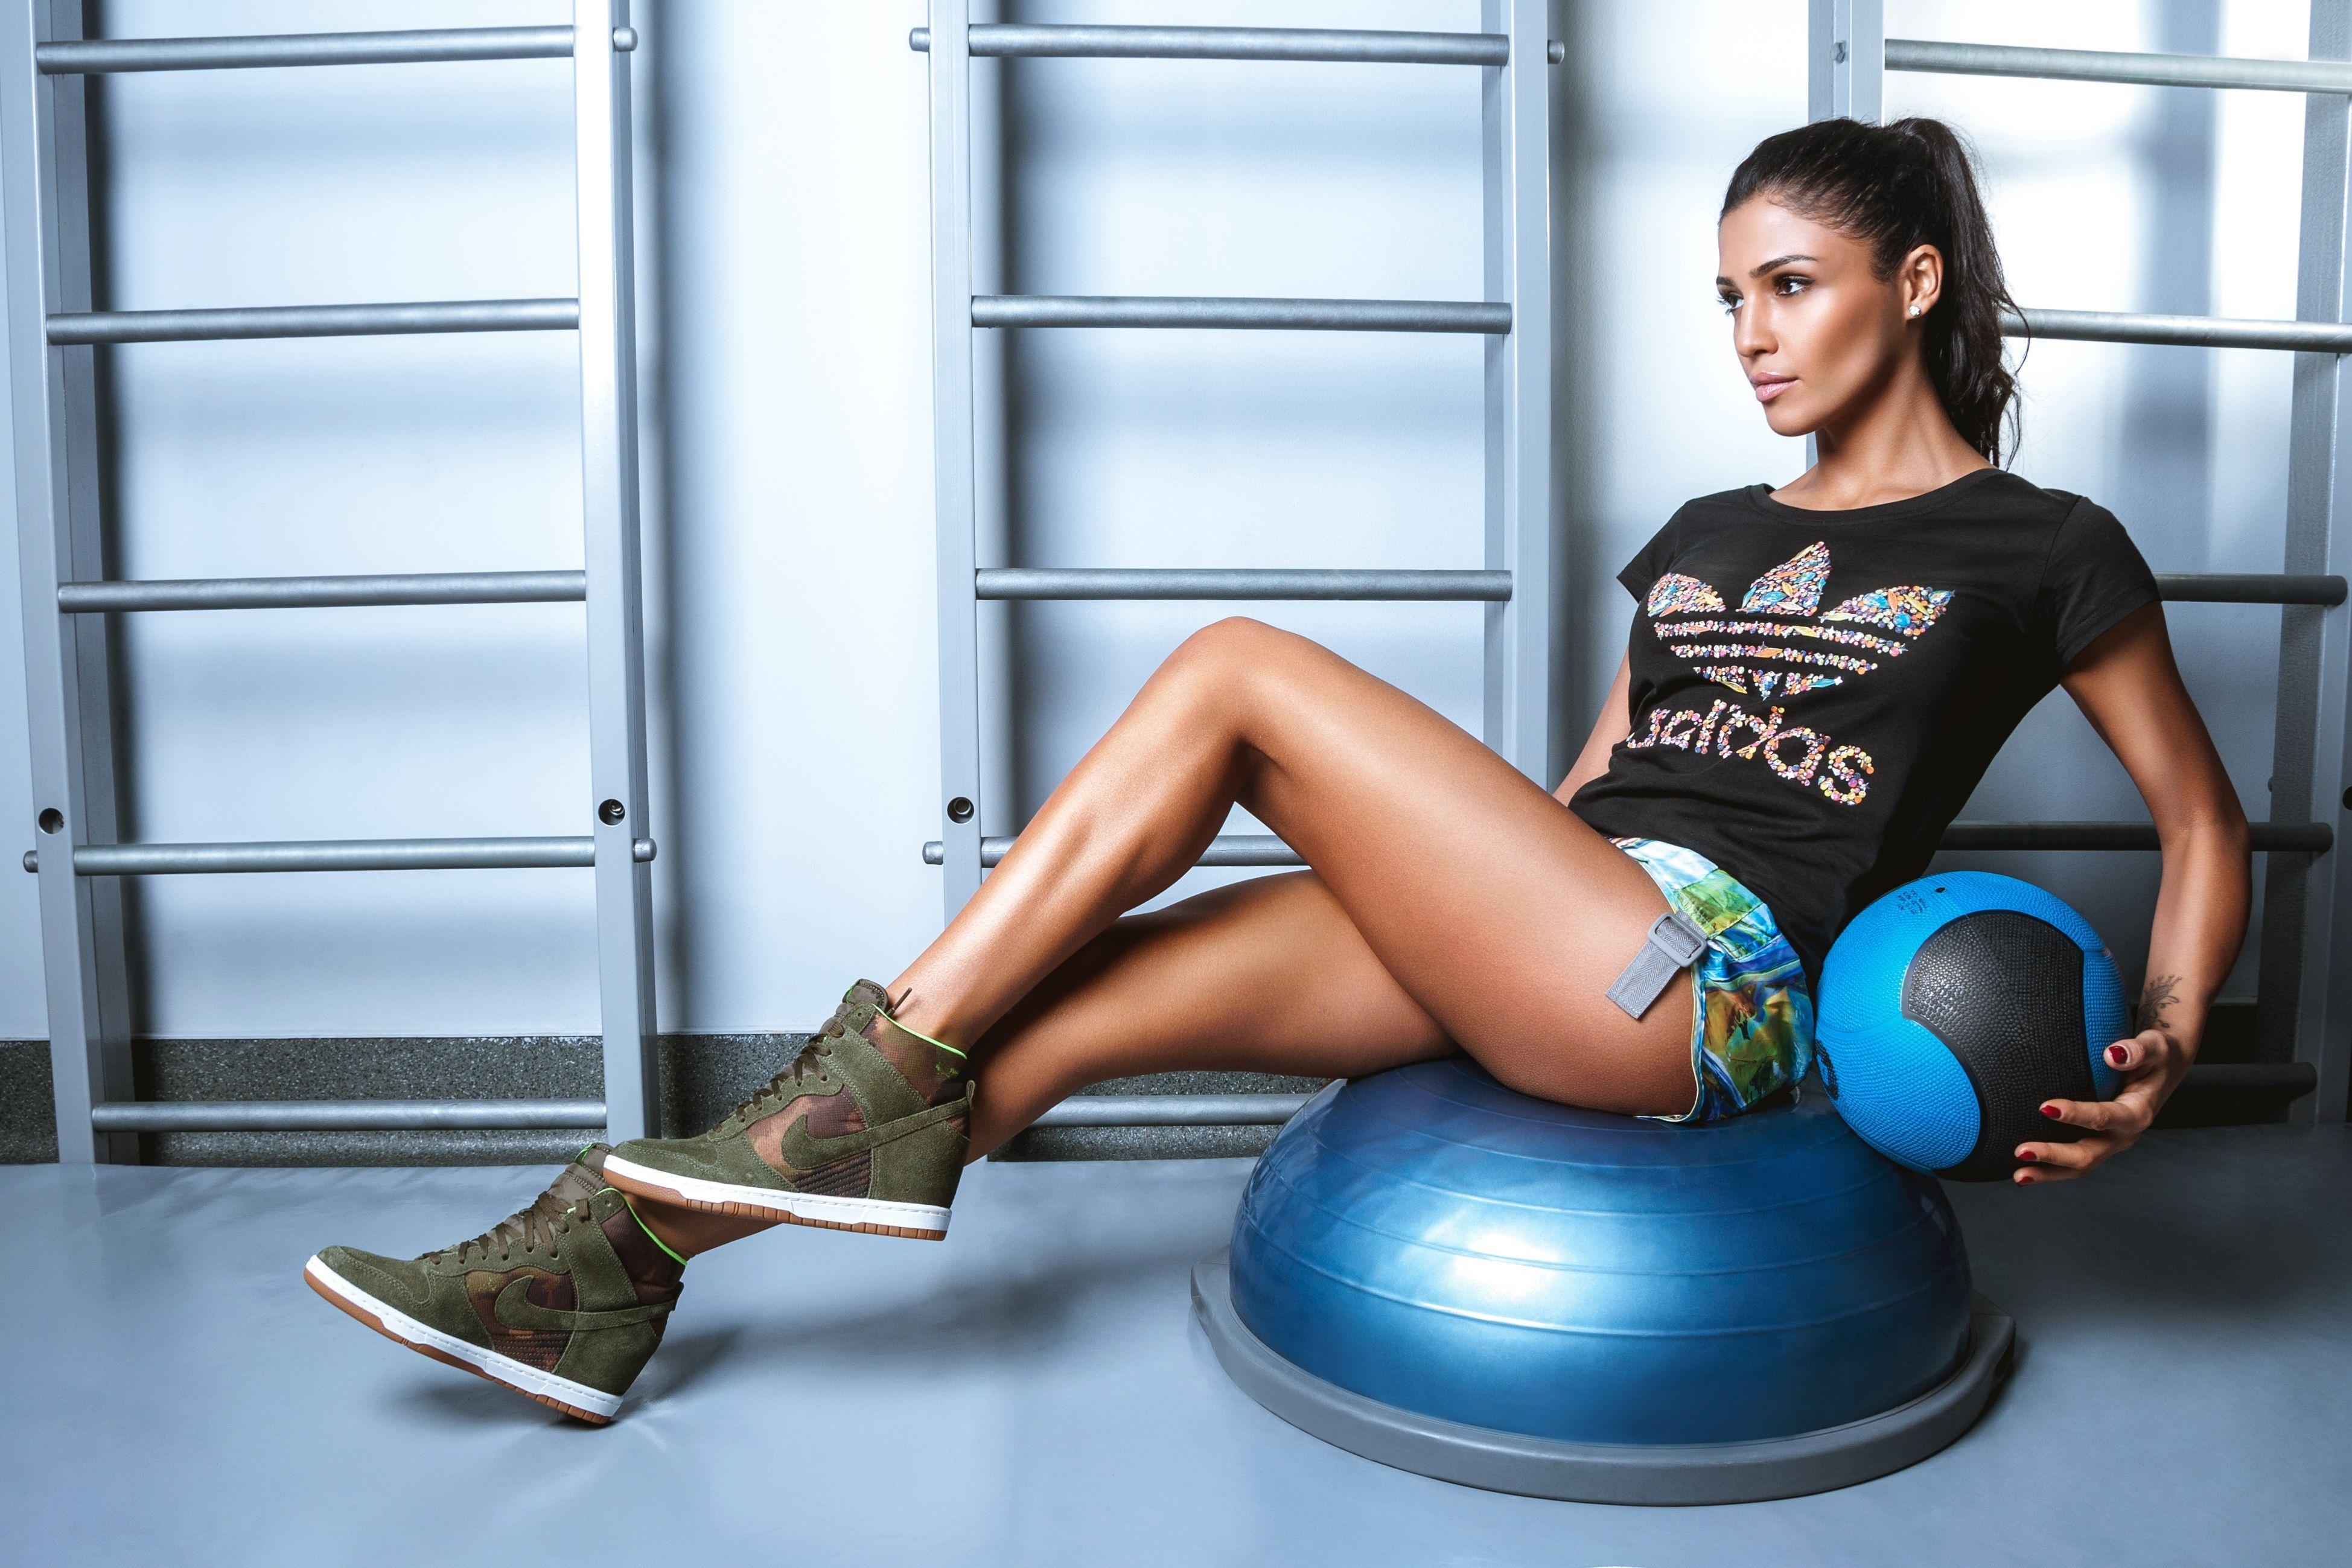 Fitness: Girl, Brunette, Woman, Fitness, Ponytail, Santa Dimopulos